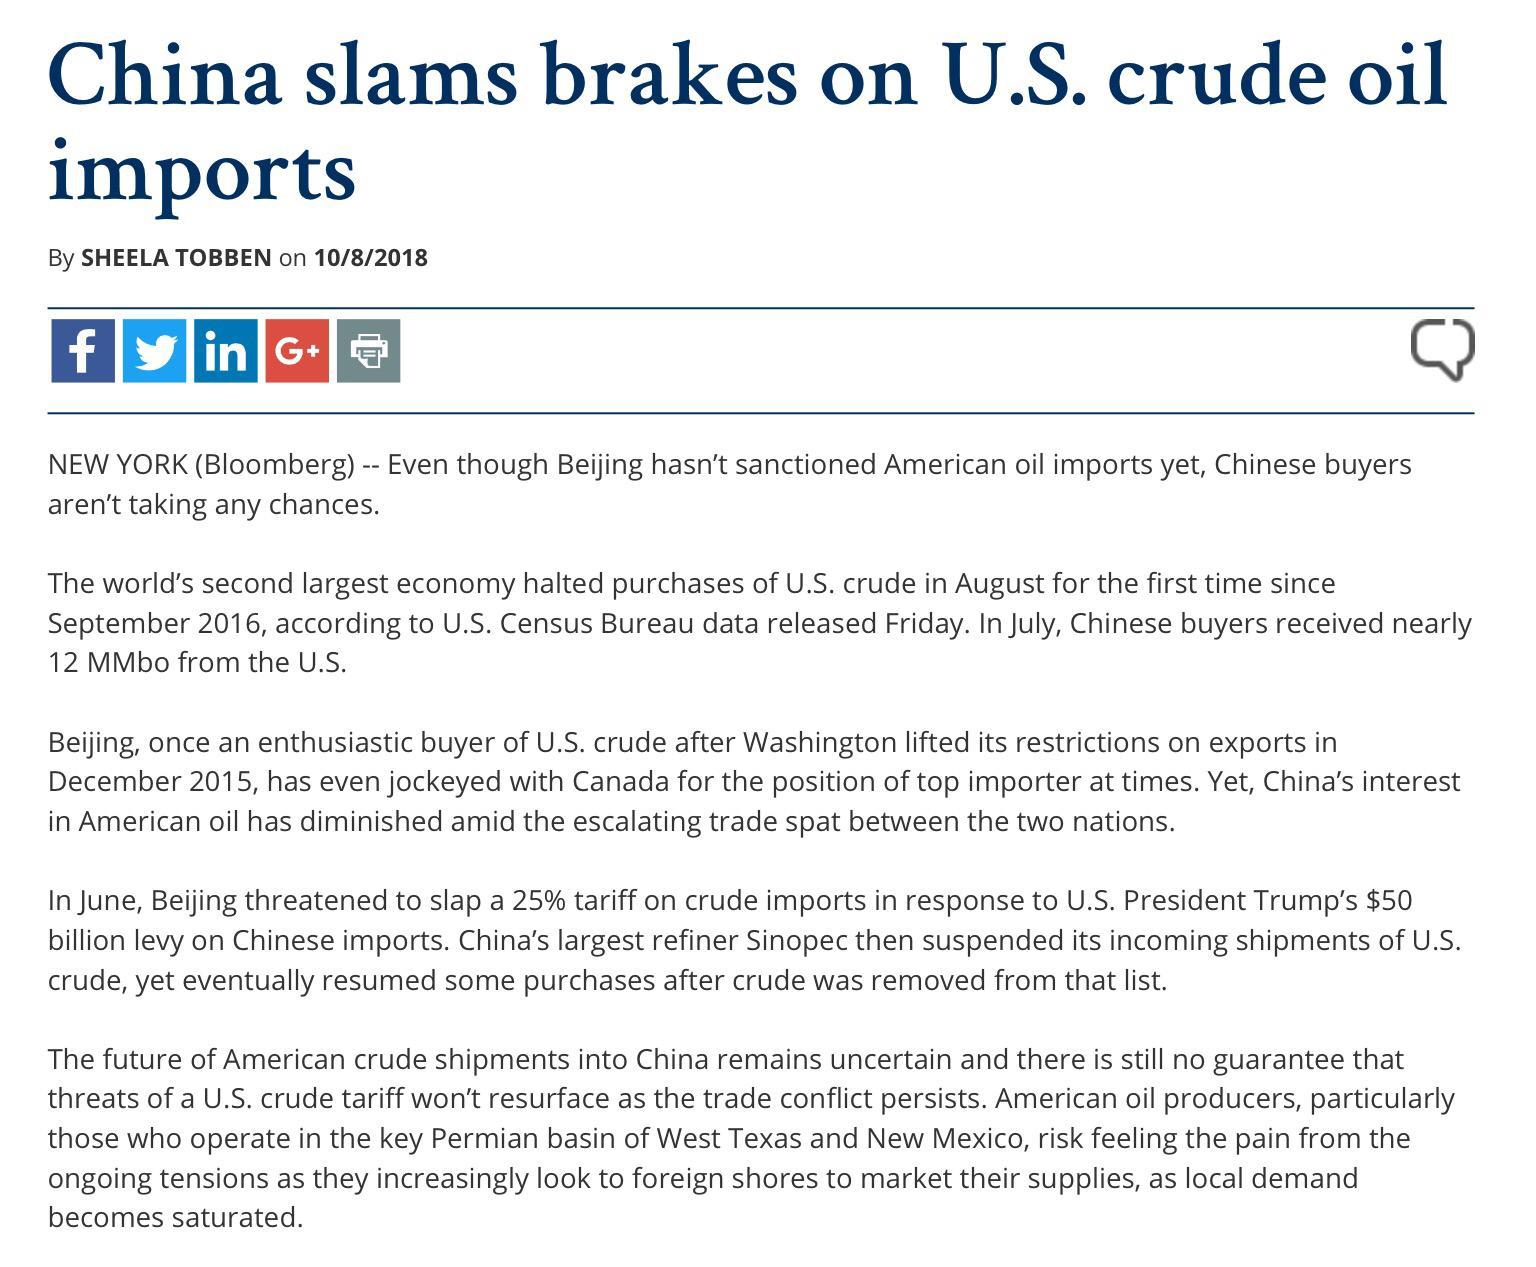 China Slams Breaks On US Crude Oil Imports